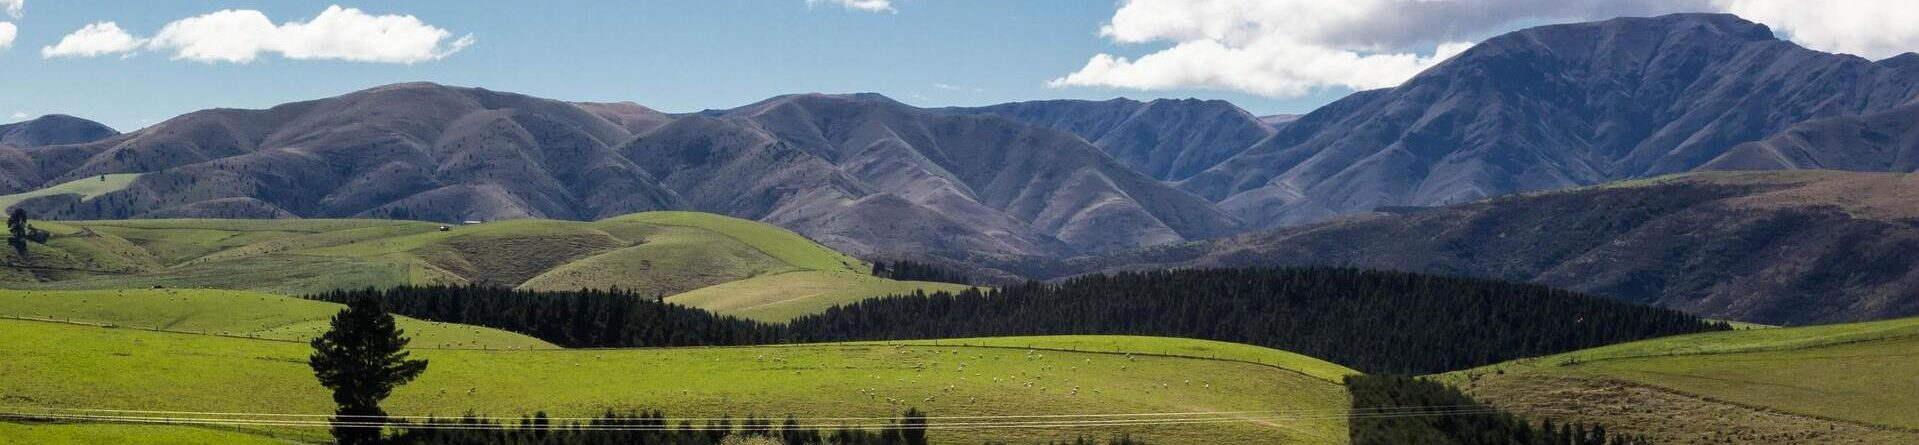 Where To Emigrate: New Zealand, Australia or Canada? Full Comparison